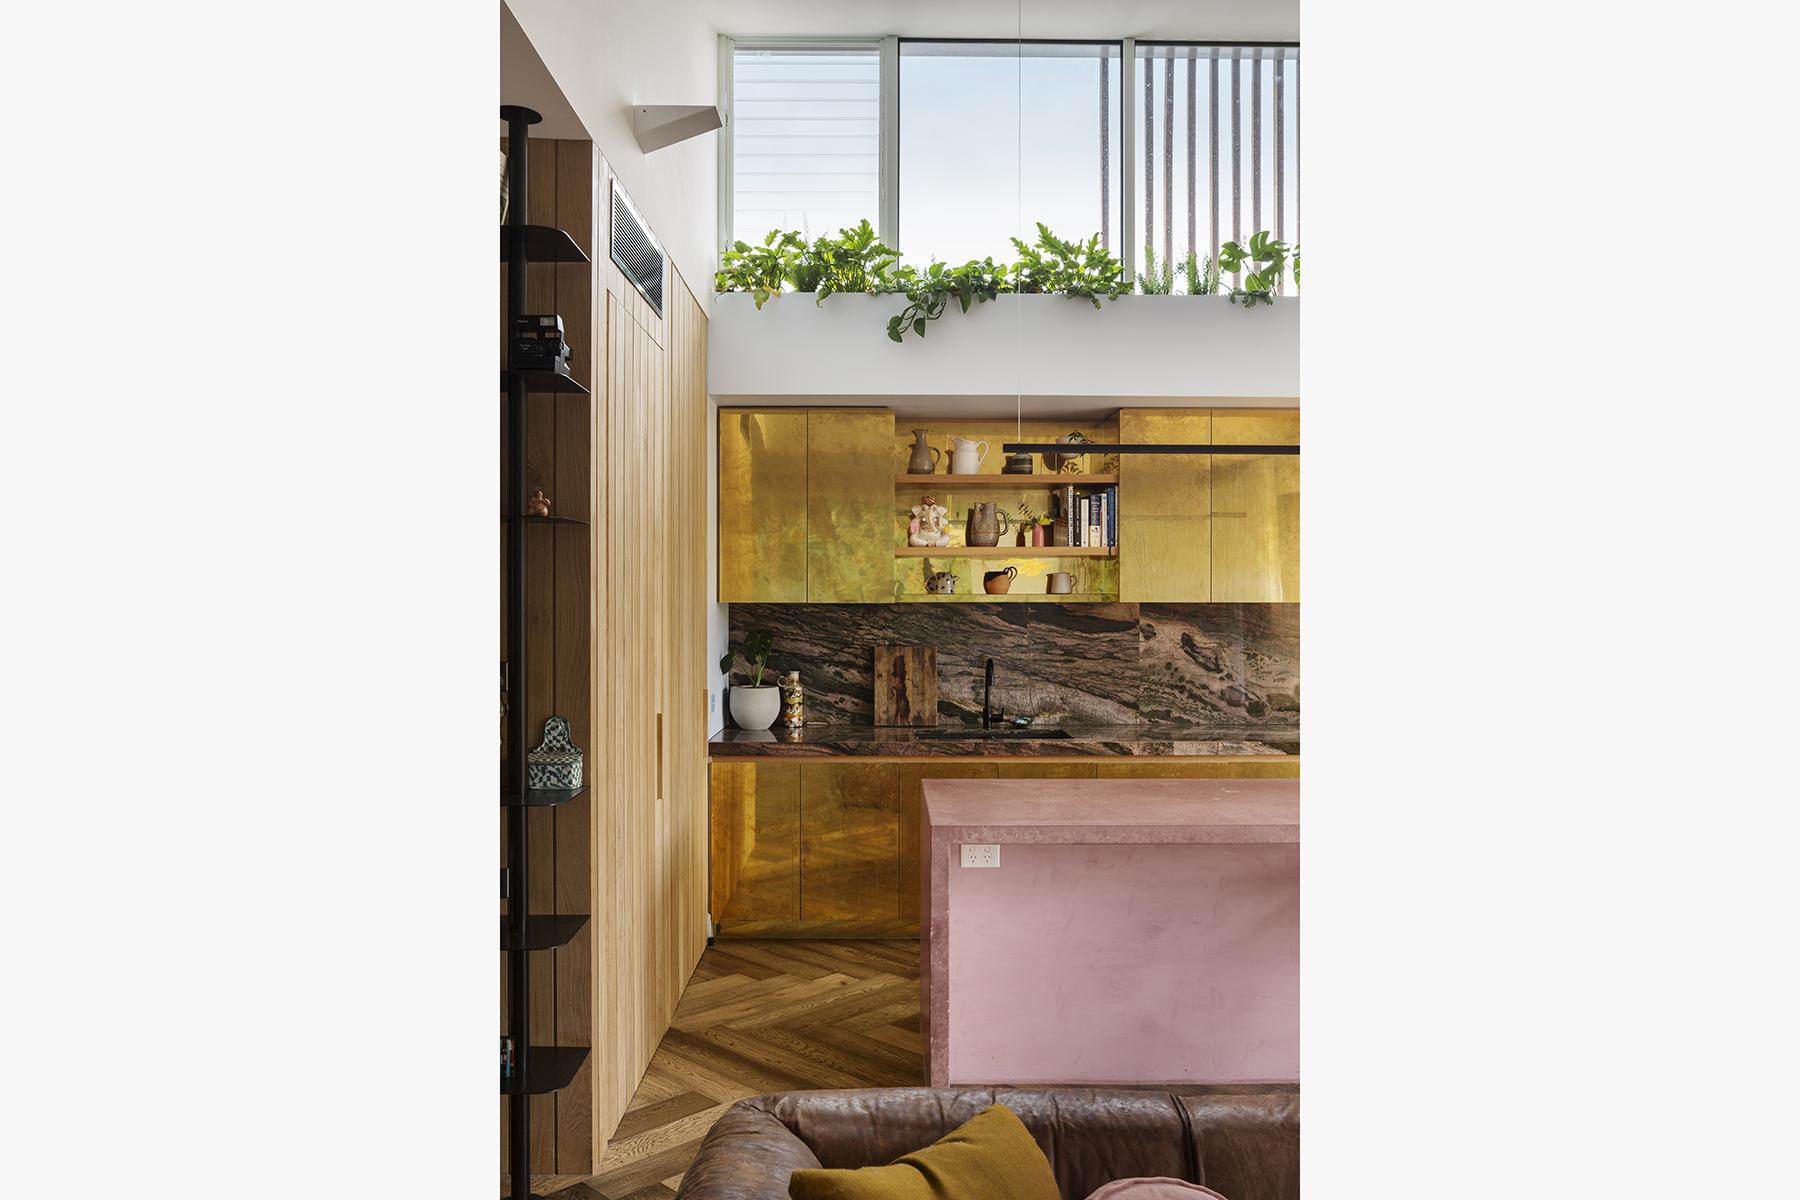 30693-KitchenSpace.jpg